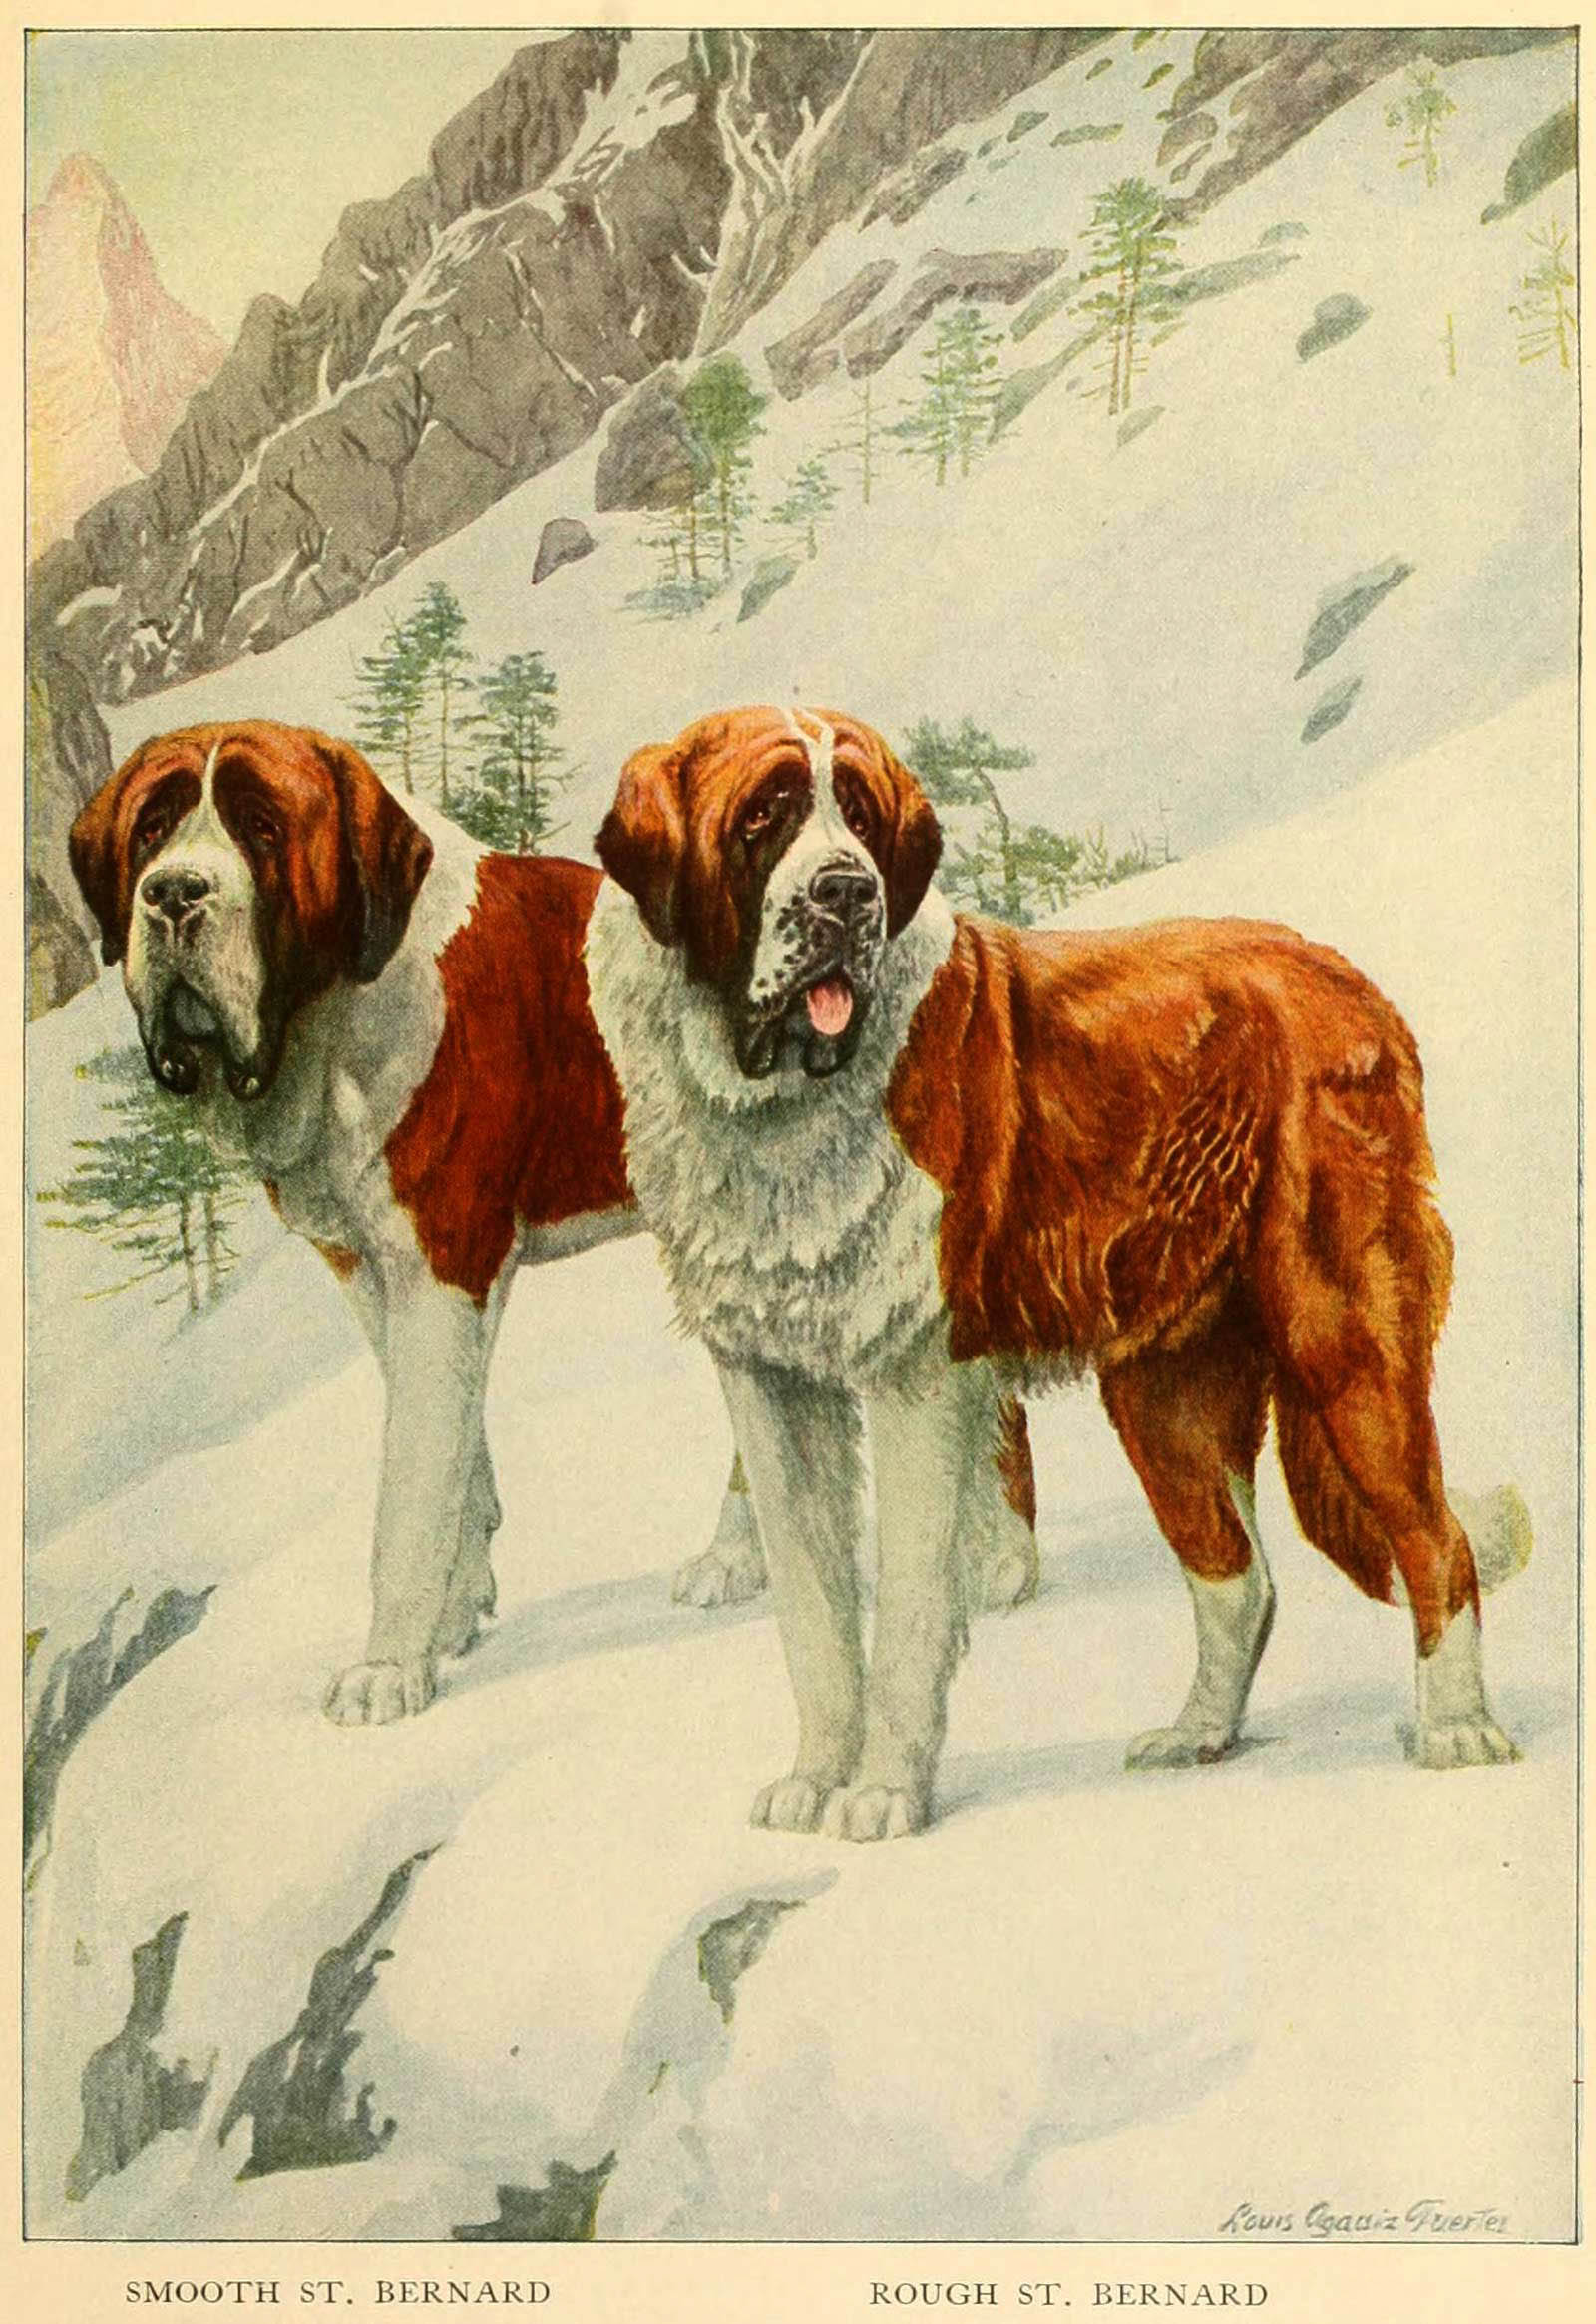 ST. BERNARD DOG BREED – Information About Dogs